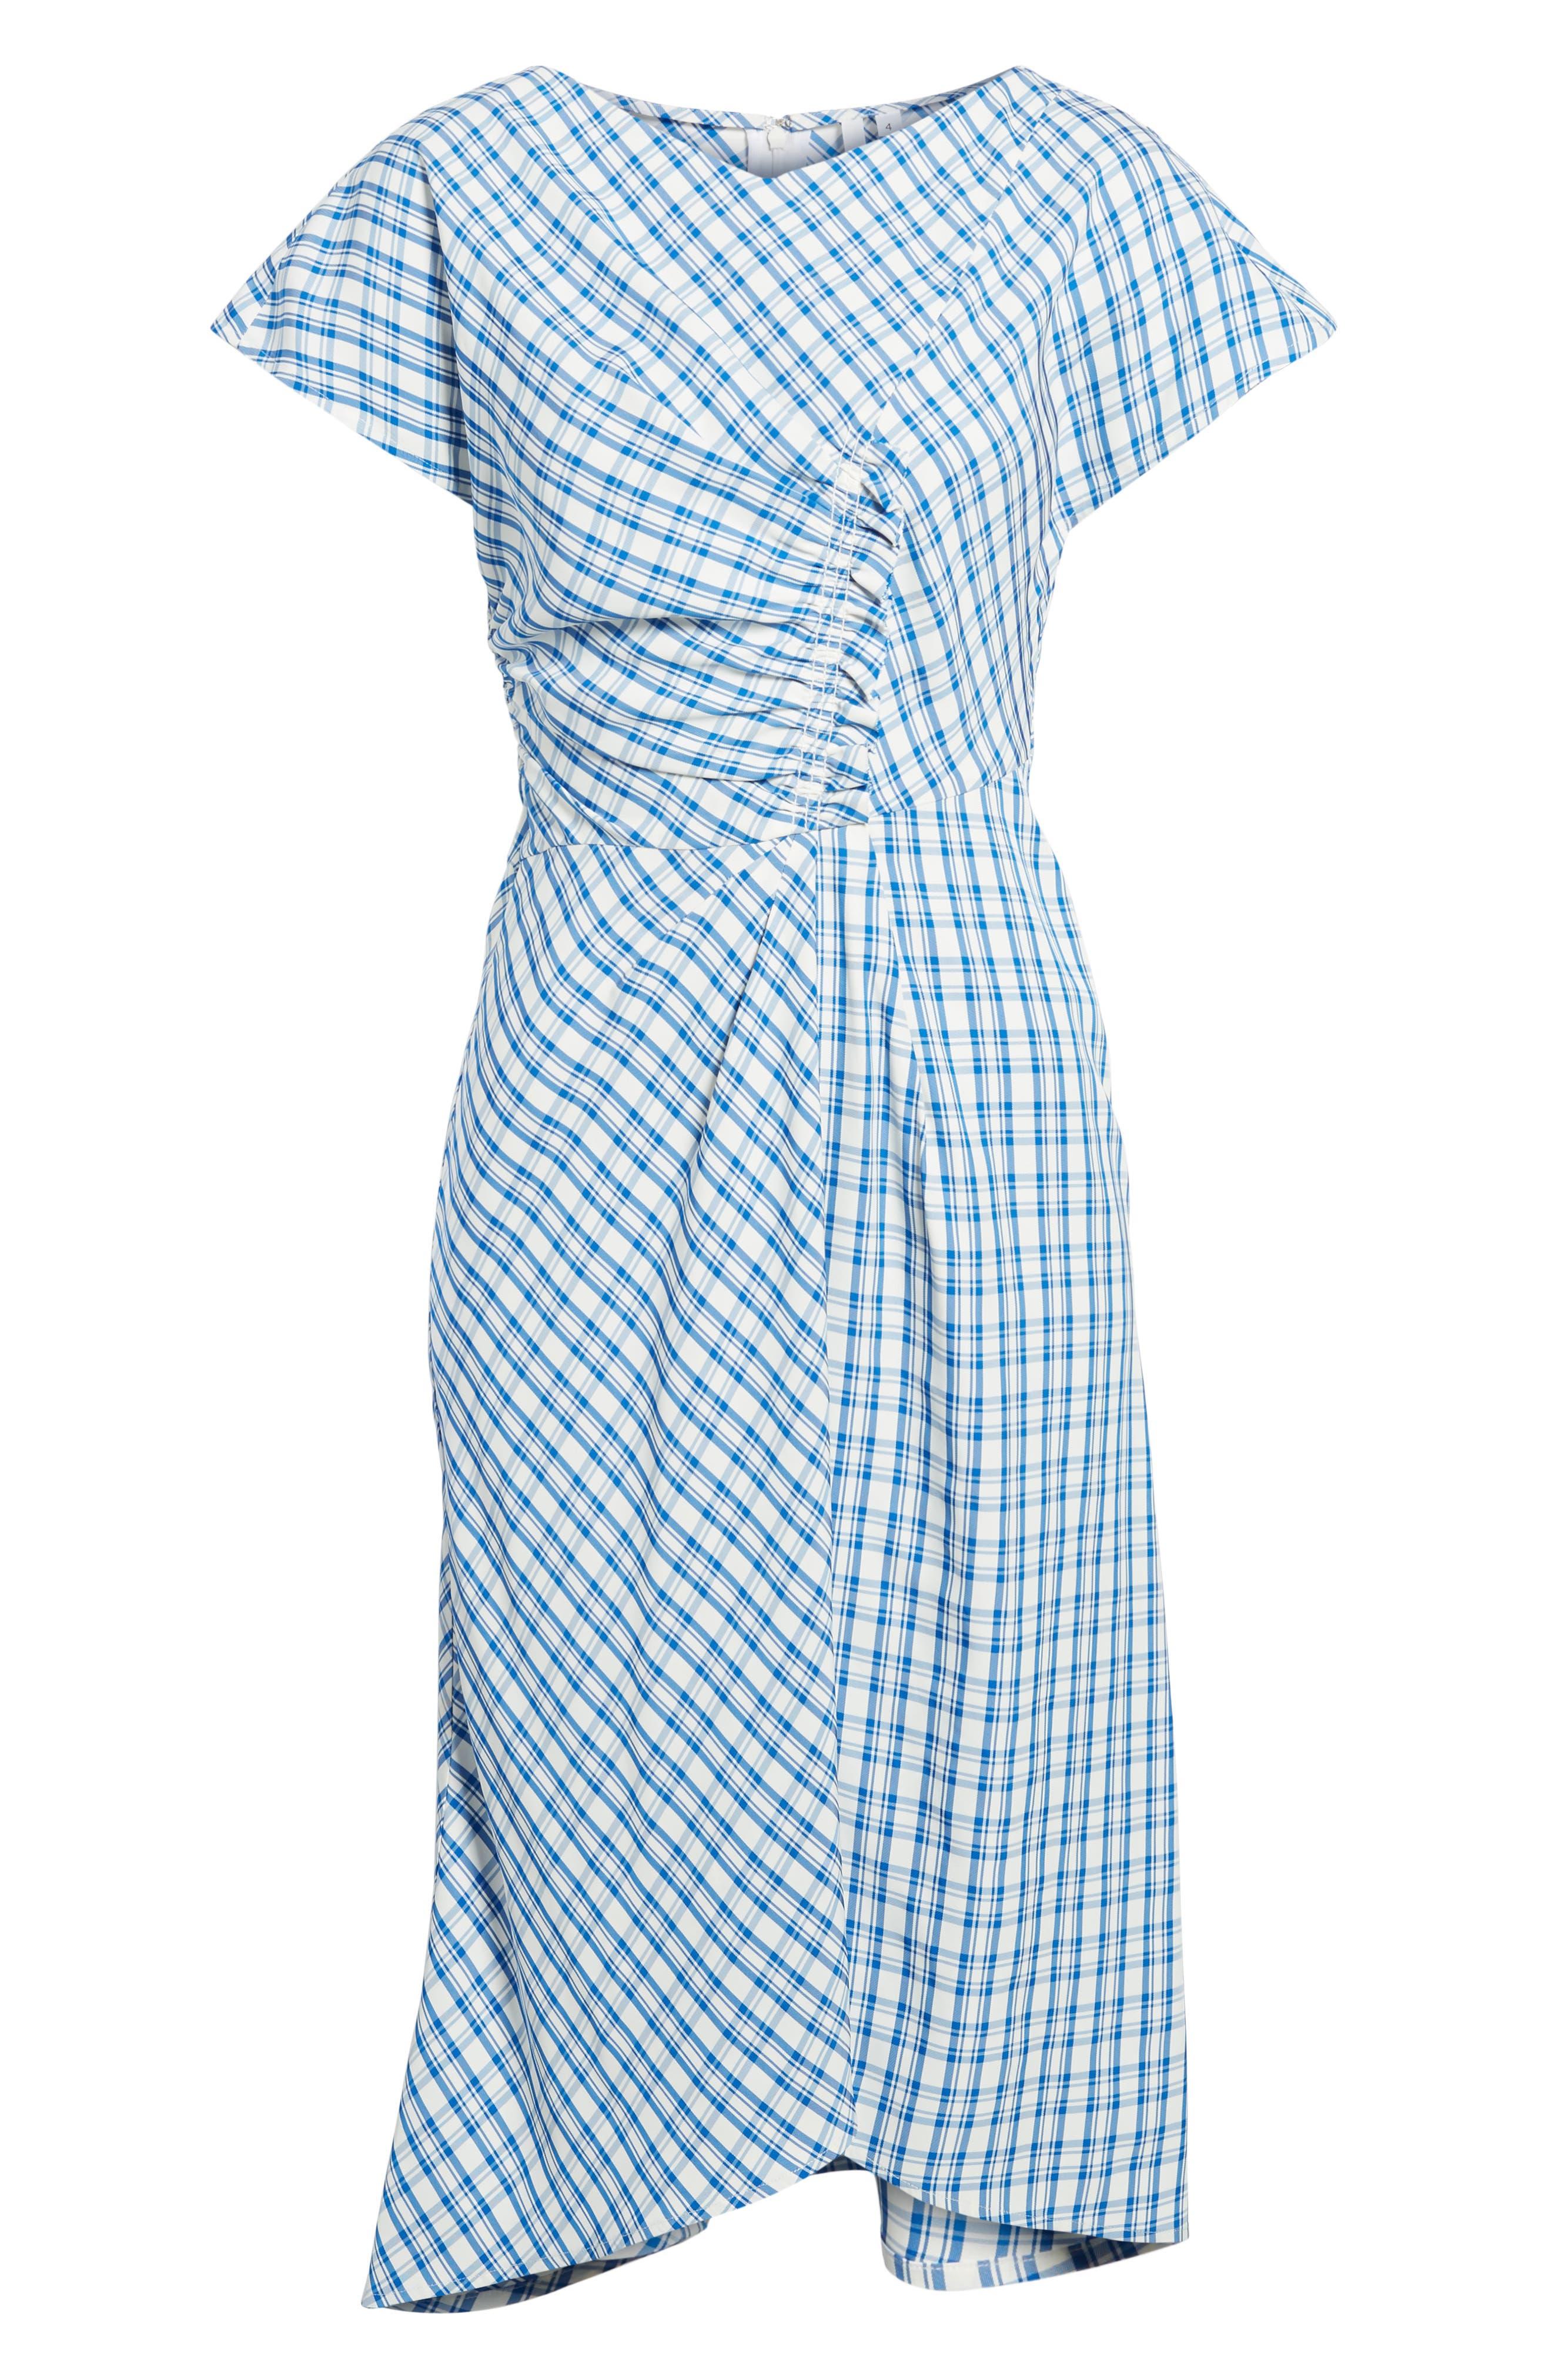 Ruched Check Midi Dress,                             Alternate thumbnail 6, color,                             Blue Sodalite Kasie Check